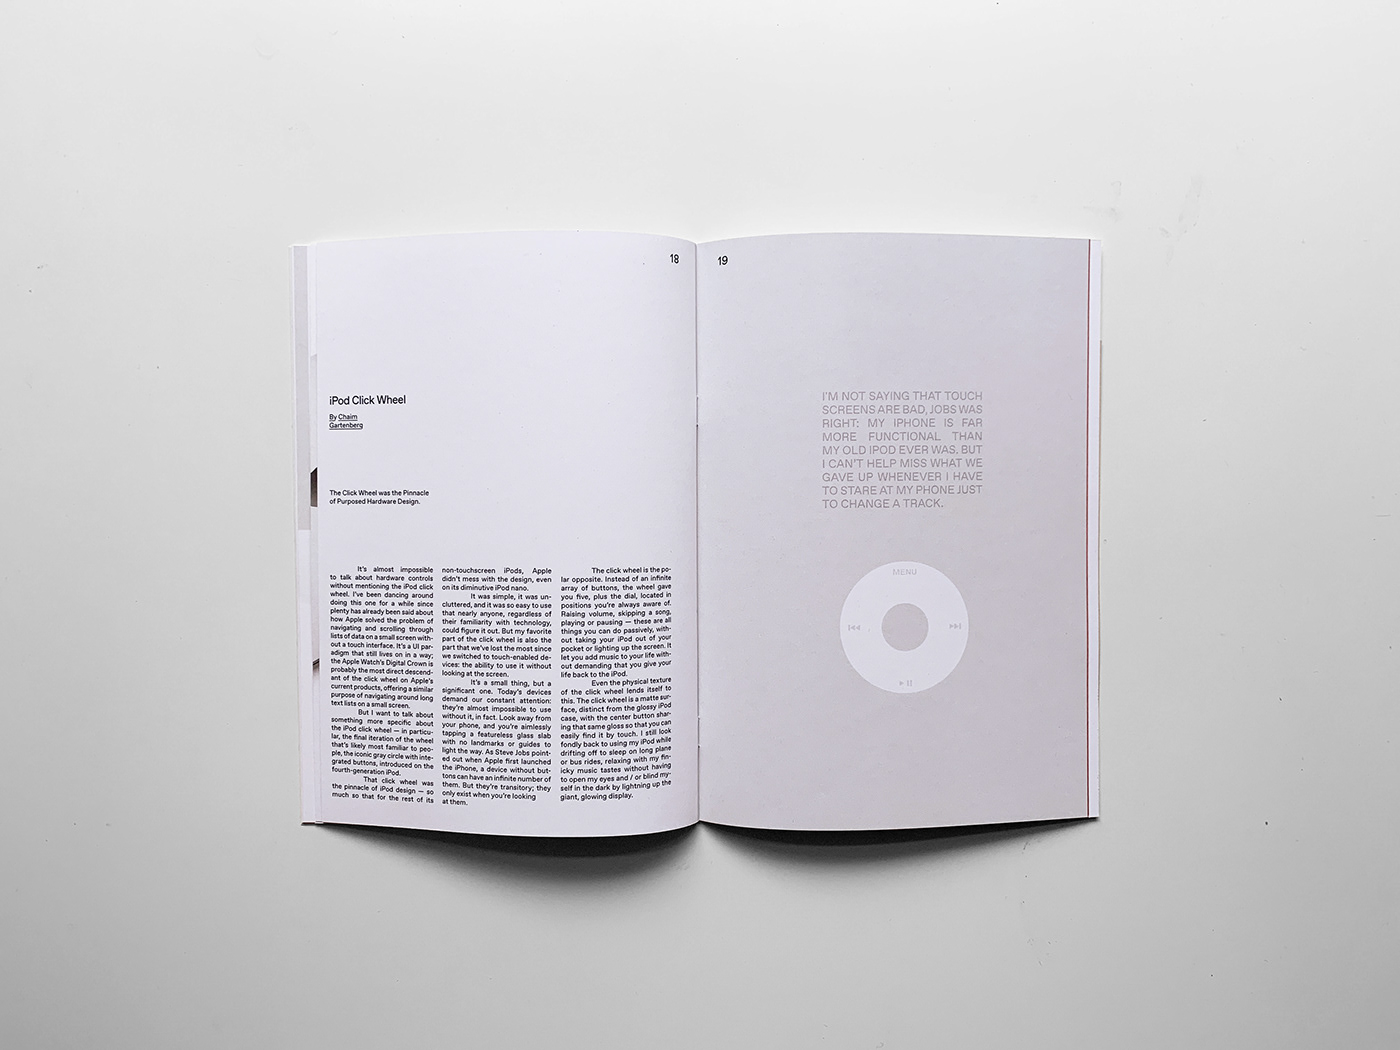 airpods apple dieter illustrations Layout magazine Minimalism muji rams sans